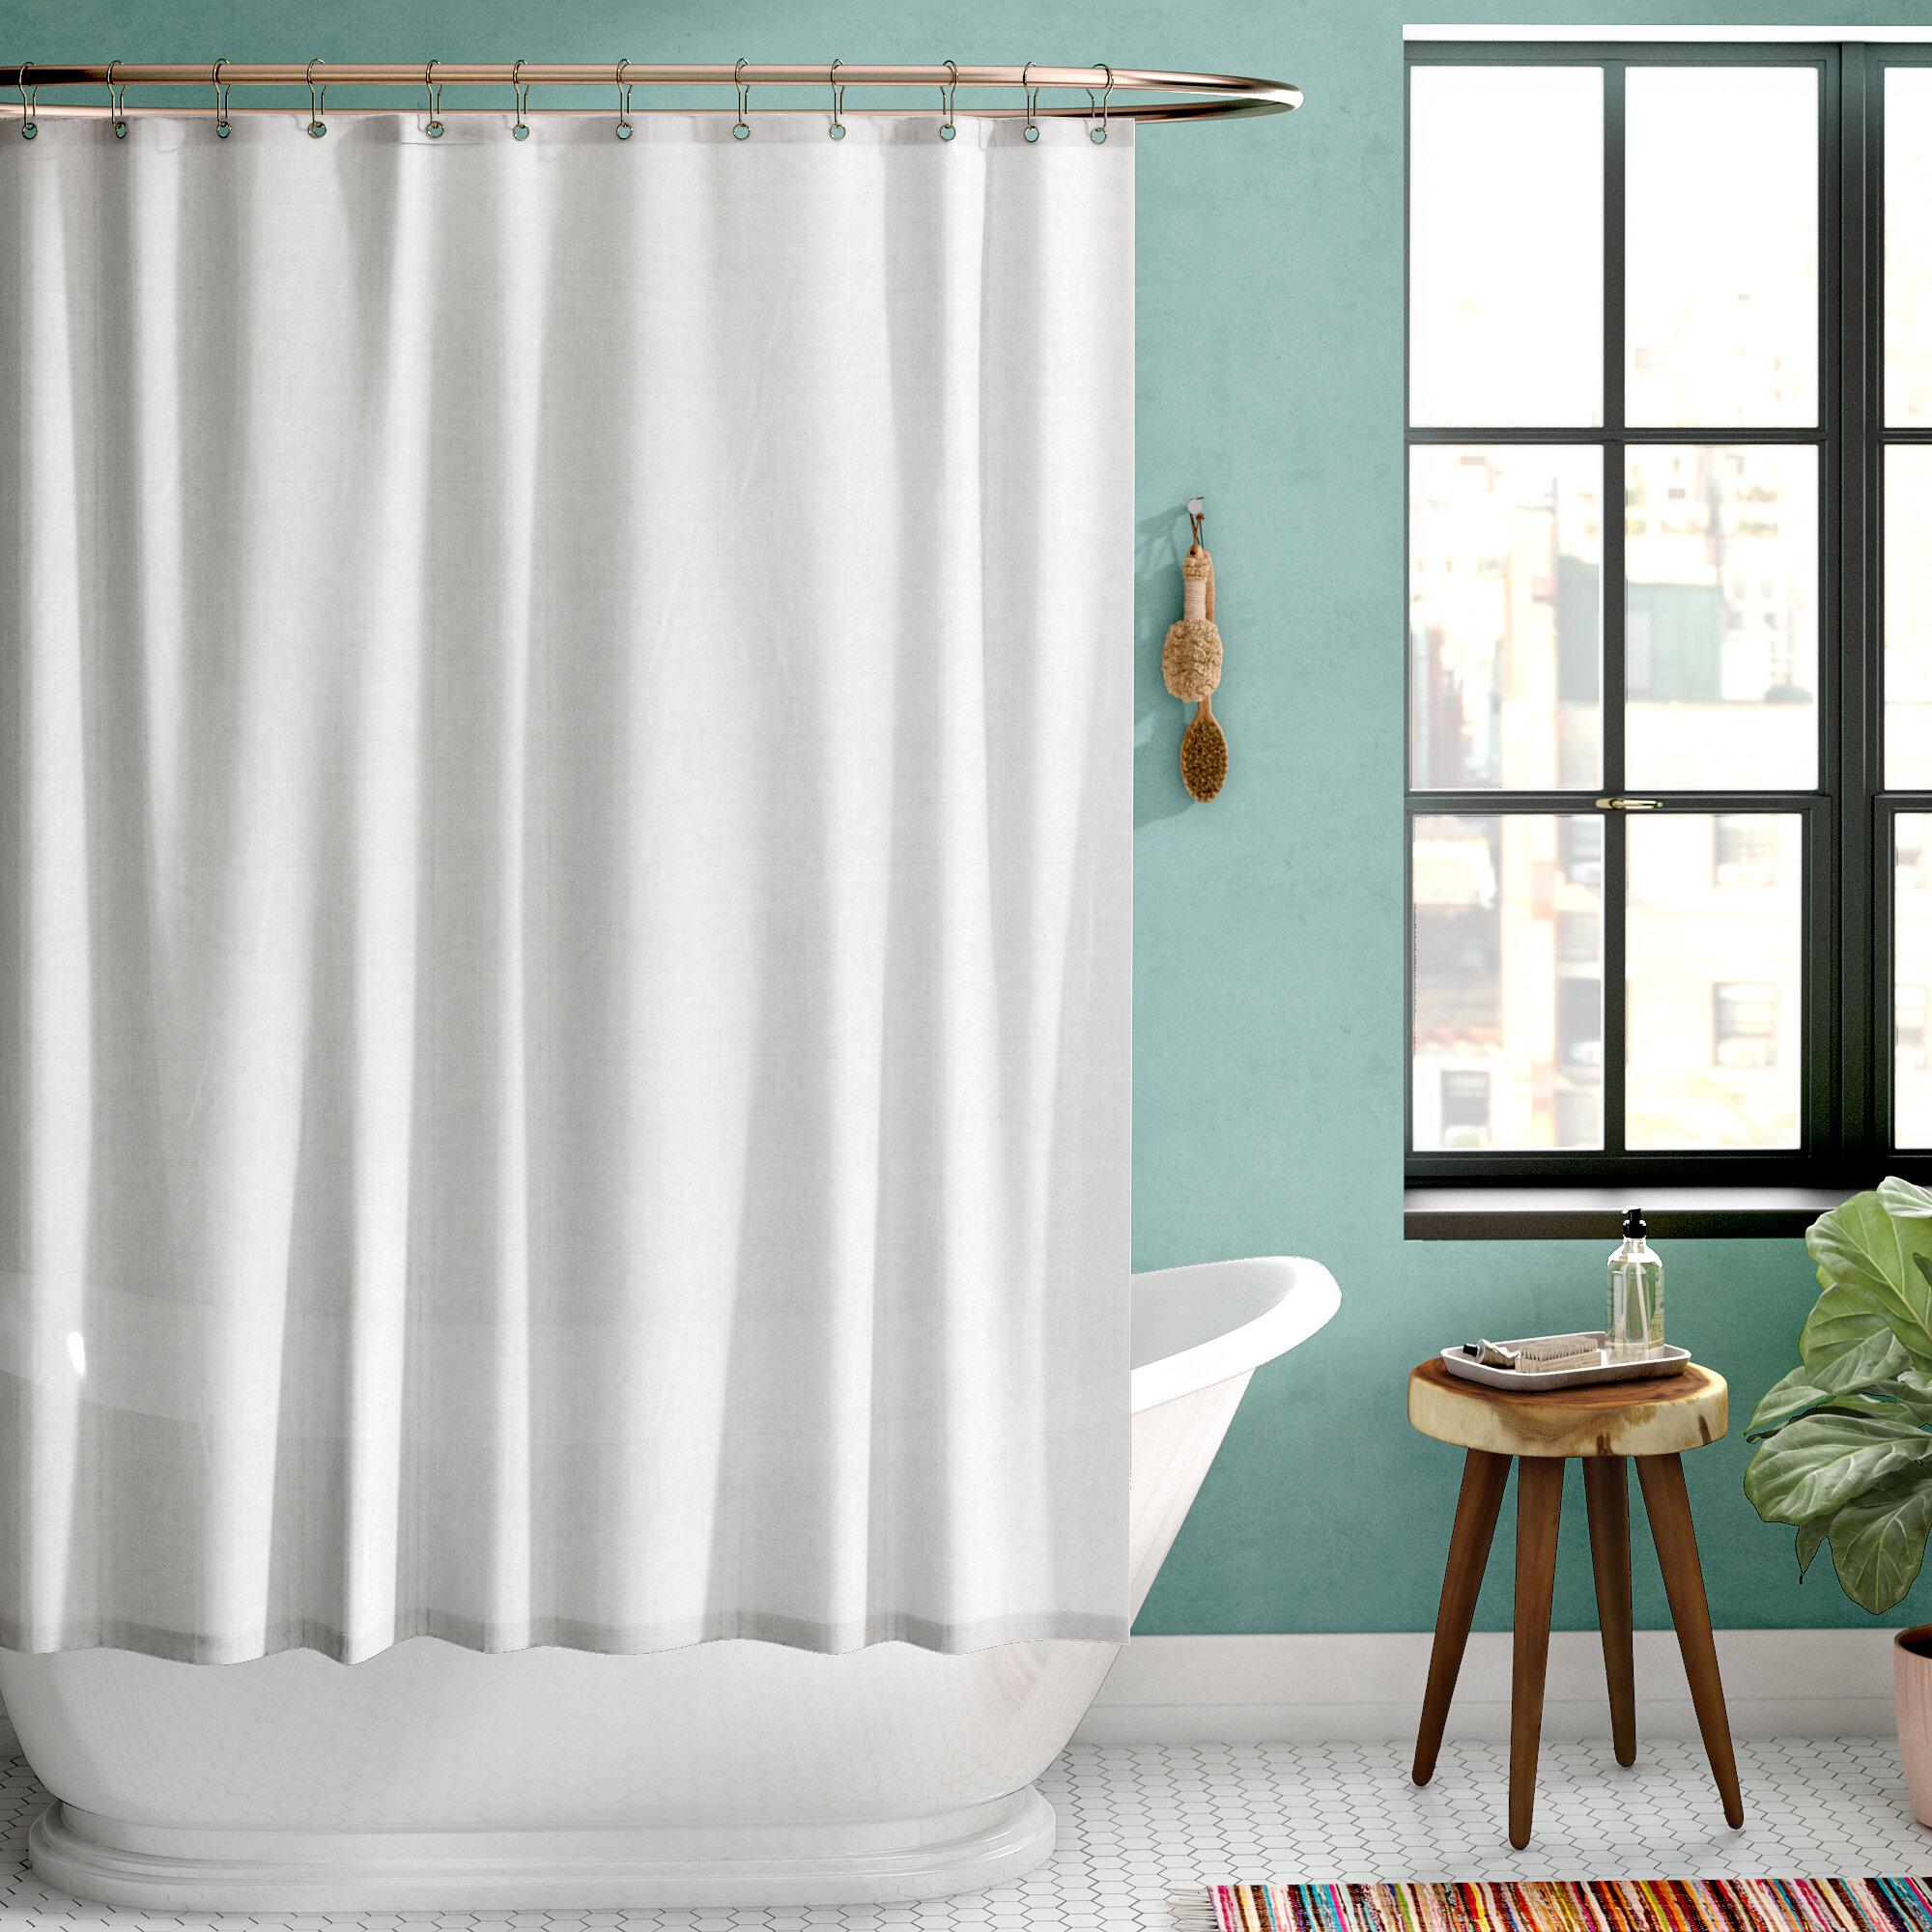 Zipcode Design Galeana Shower Curtain Liner & Reviews | Wayfair